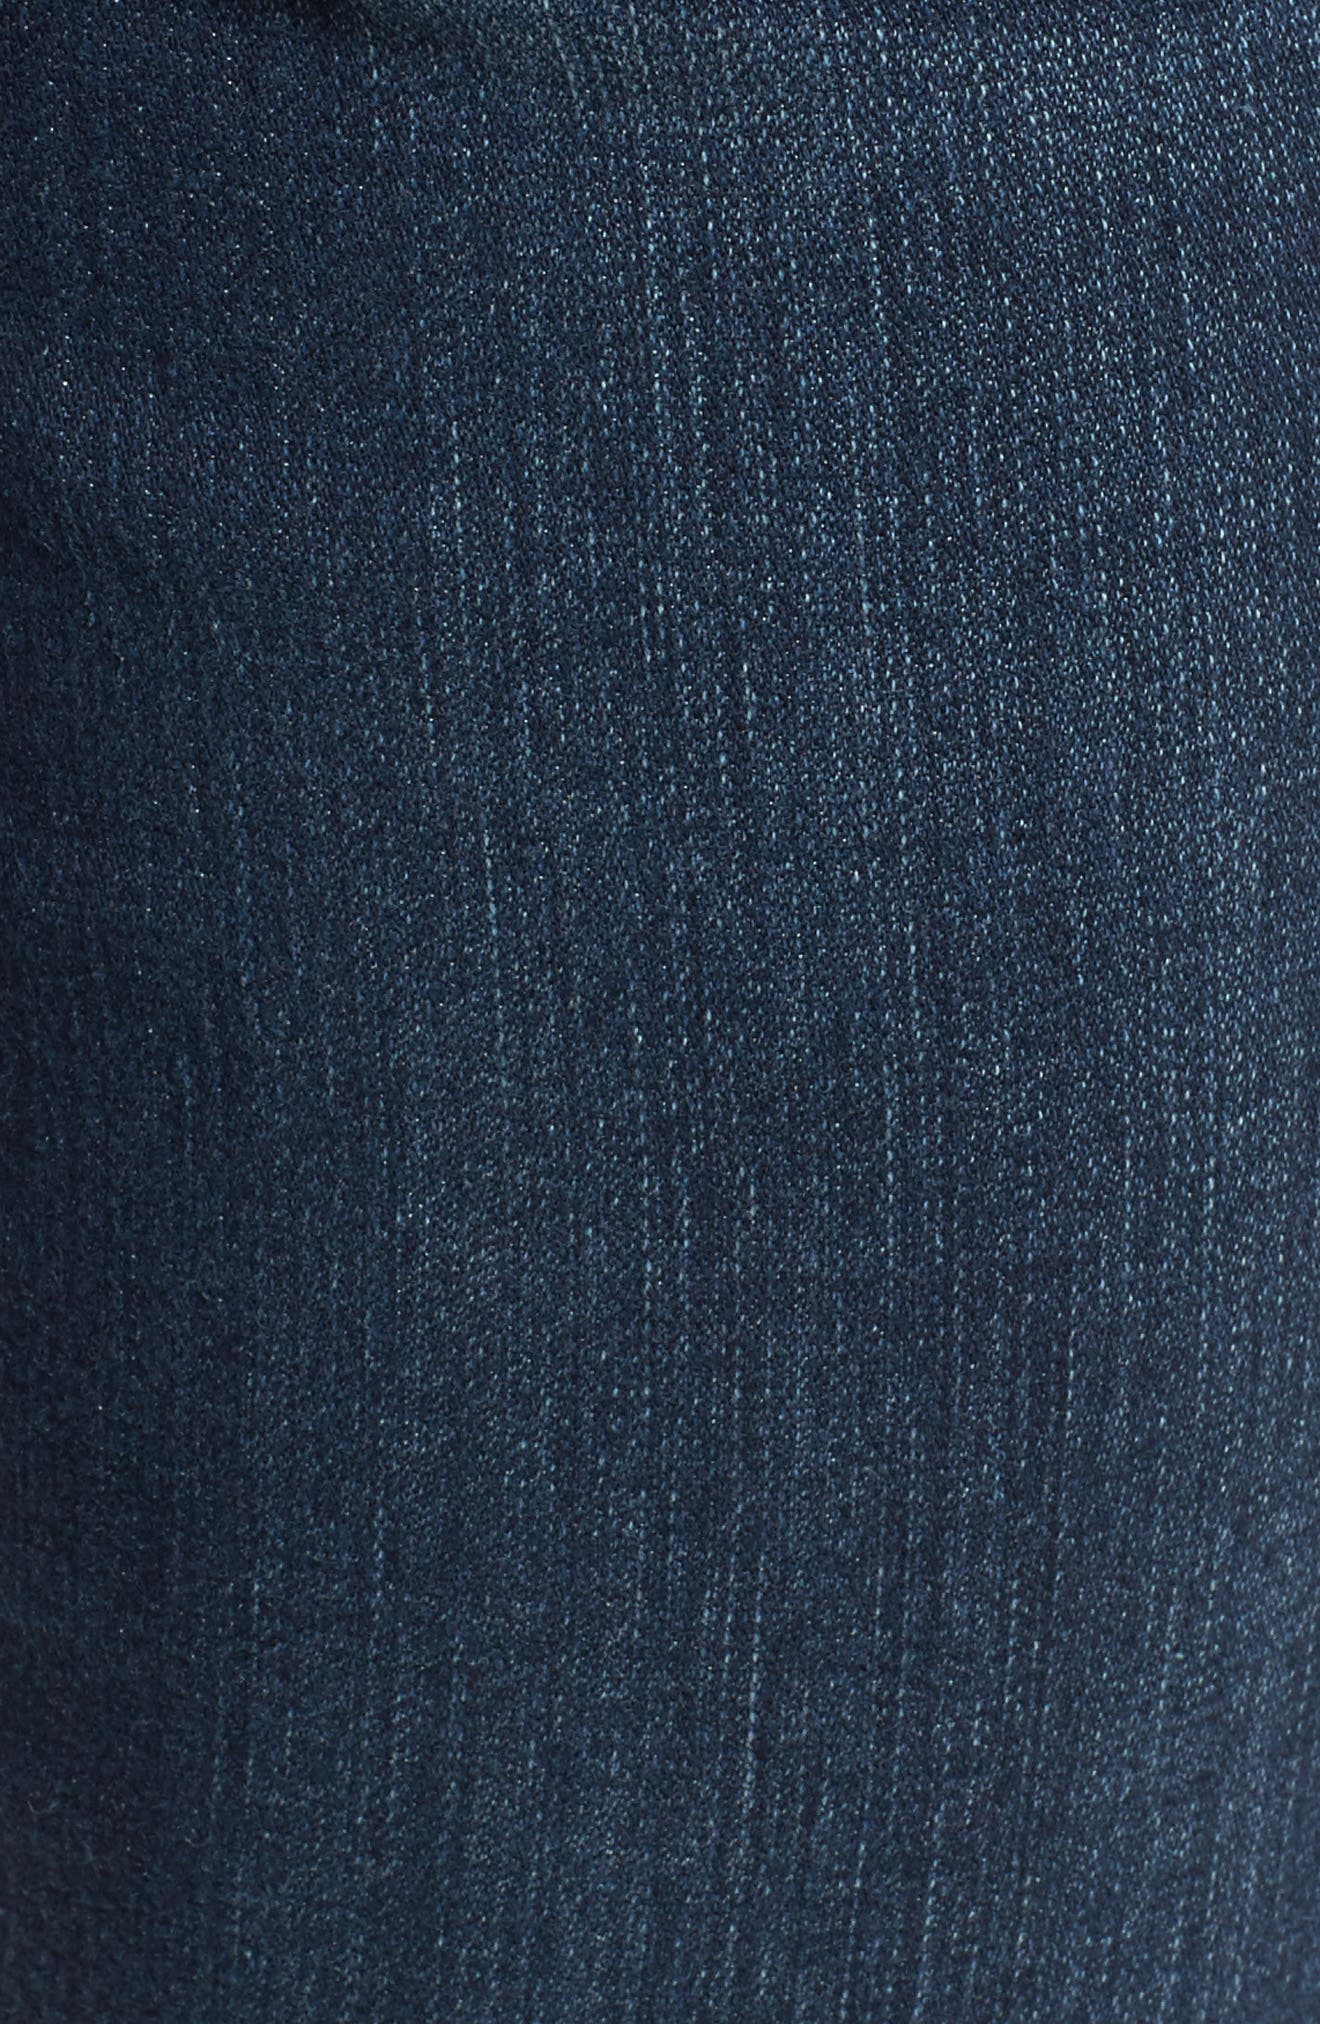 Paley Stretch Bootcut Jeans,                             Alternate thumbnail 5, color,                             Dark Indigo